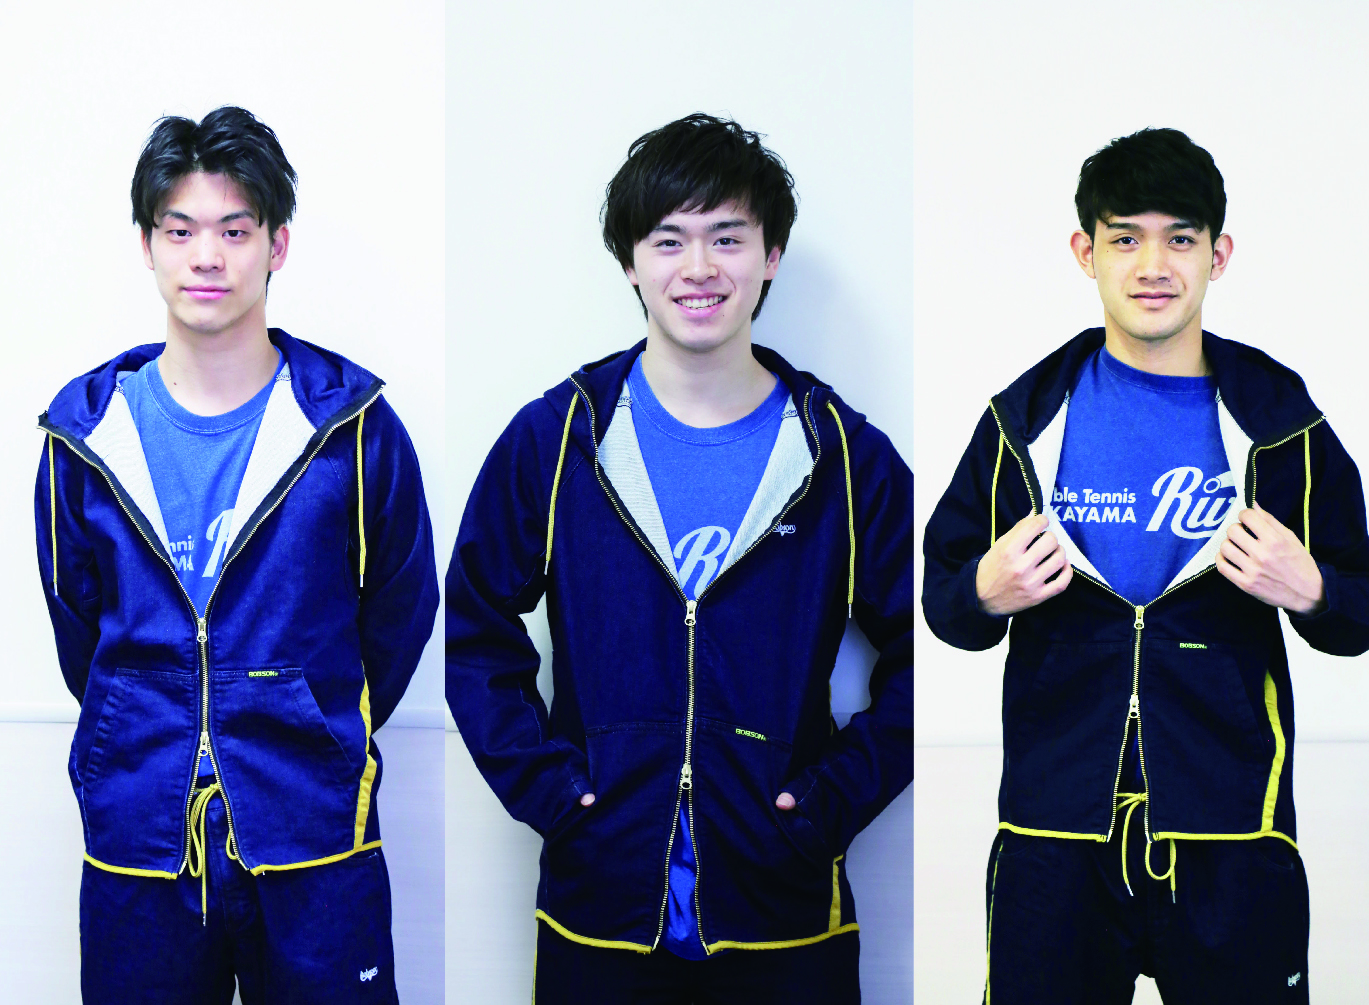 Tリーグ チーム岡山 チーム名発表 記者会見